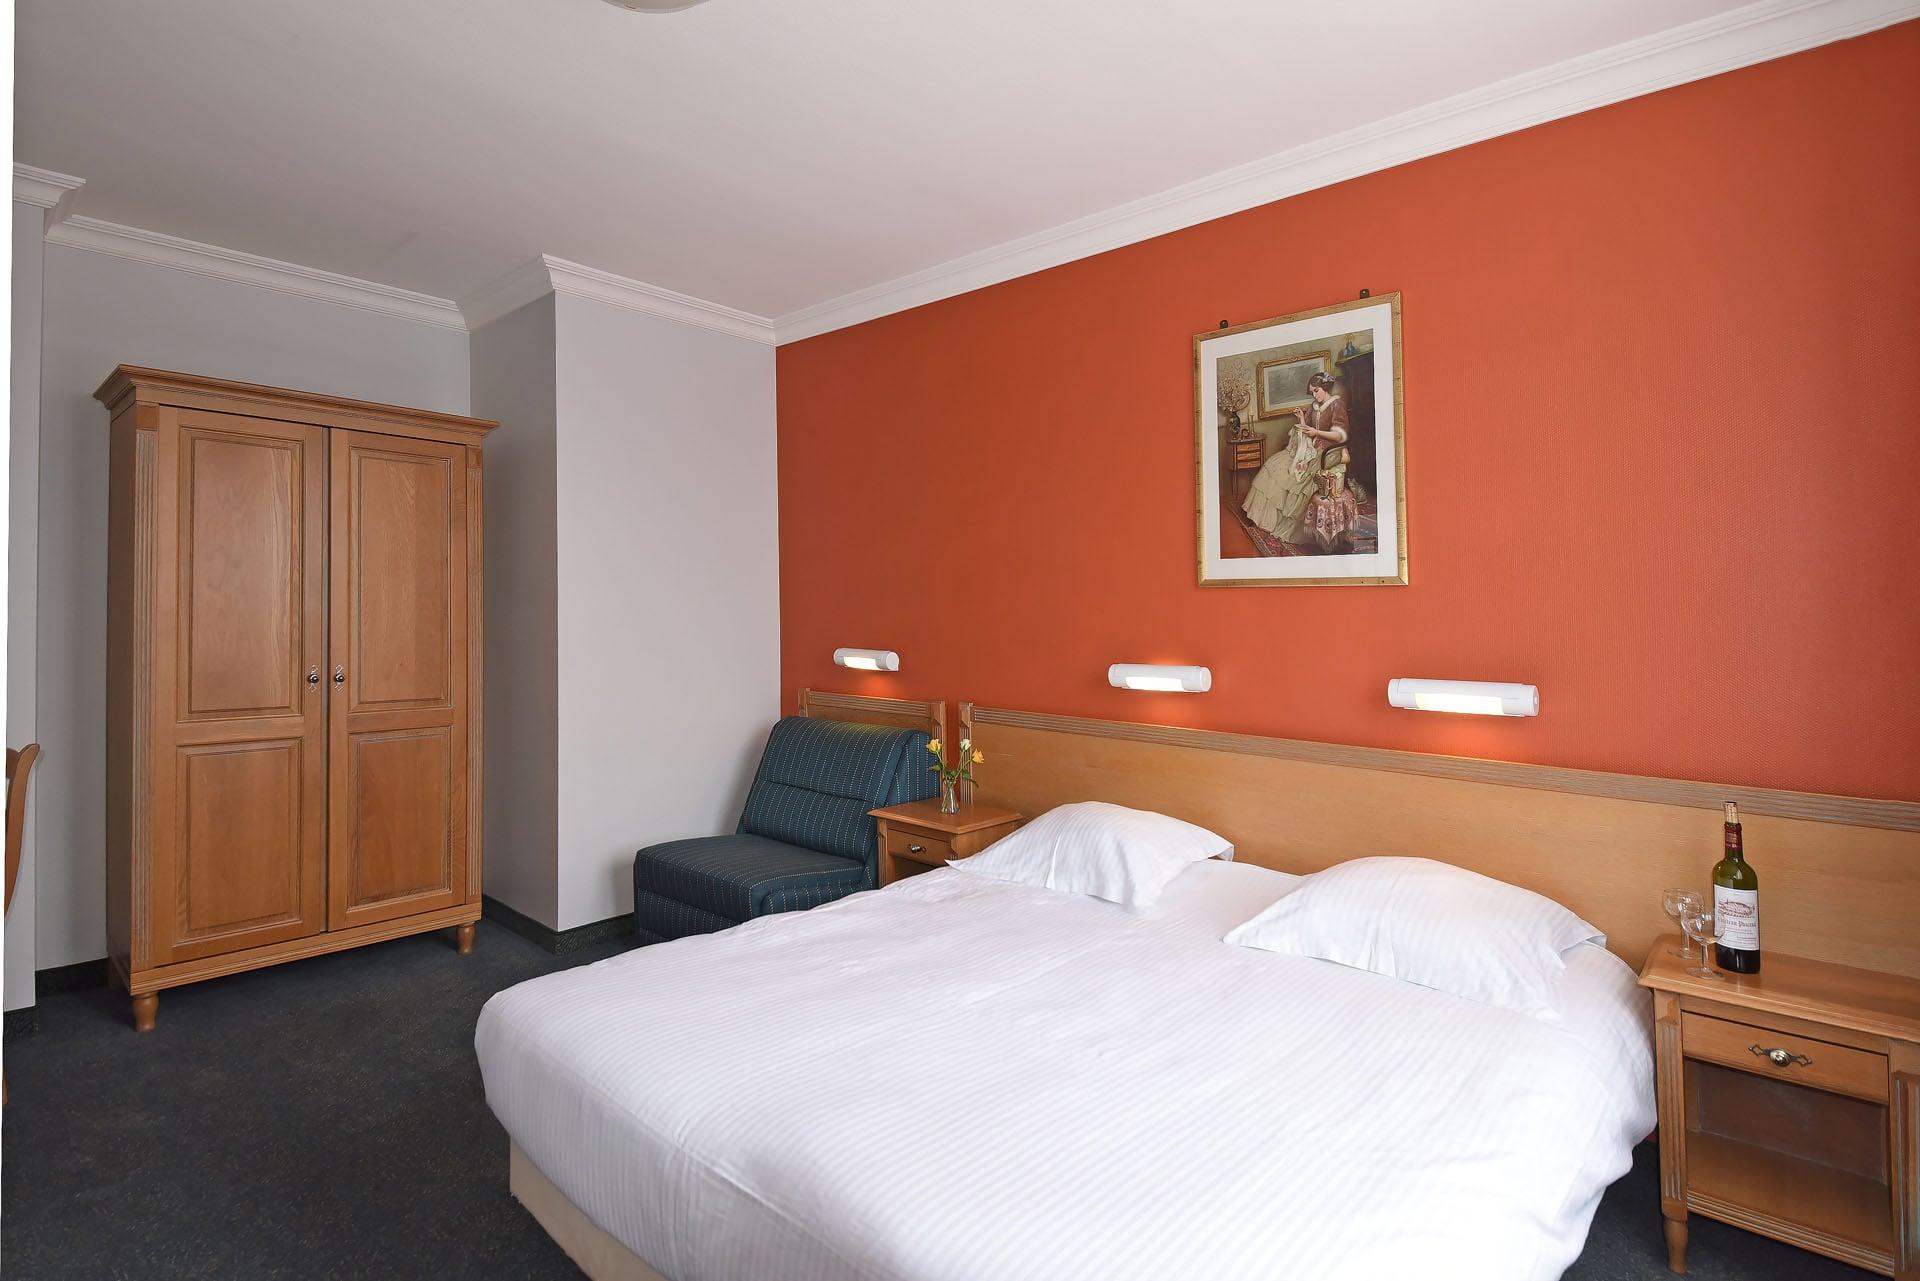 Rooms - Sabot d'Or